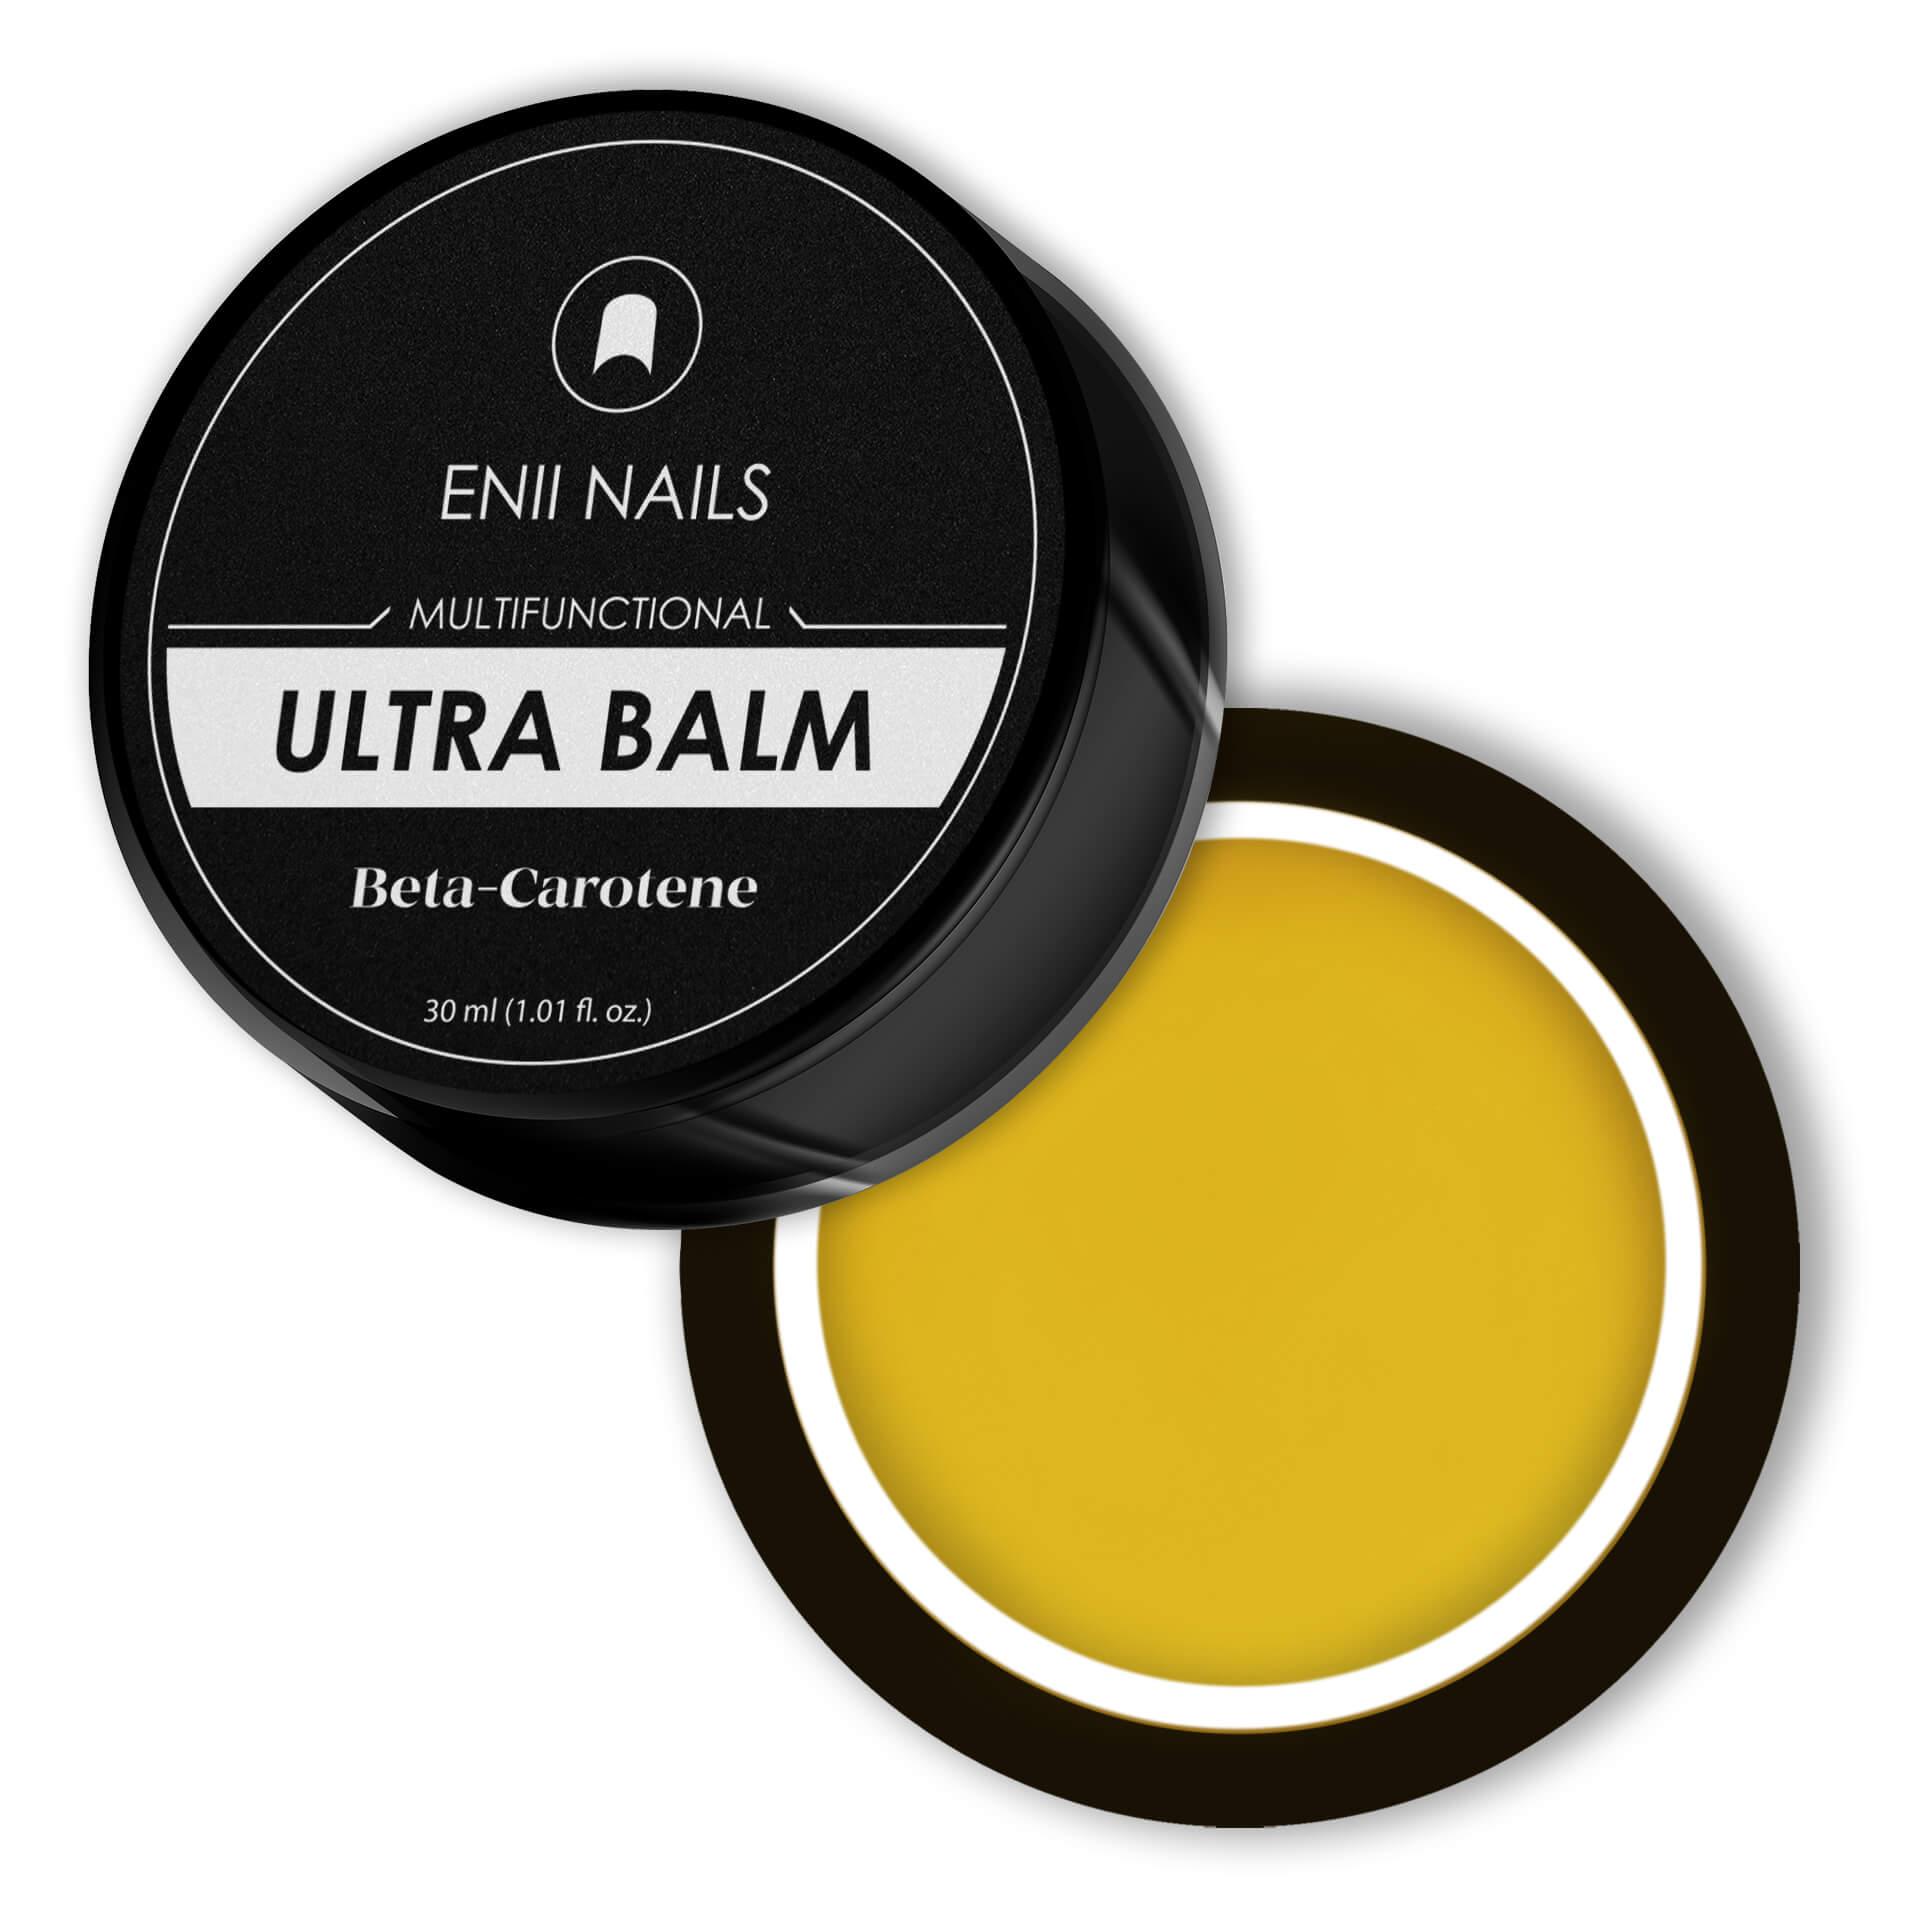 MULTI-FUNCTIONAL ULTRA BALM Beta-Carotene - fruity